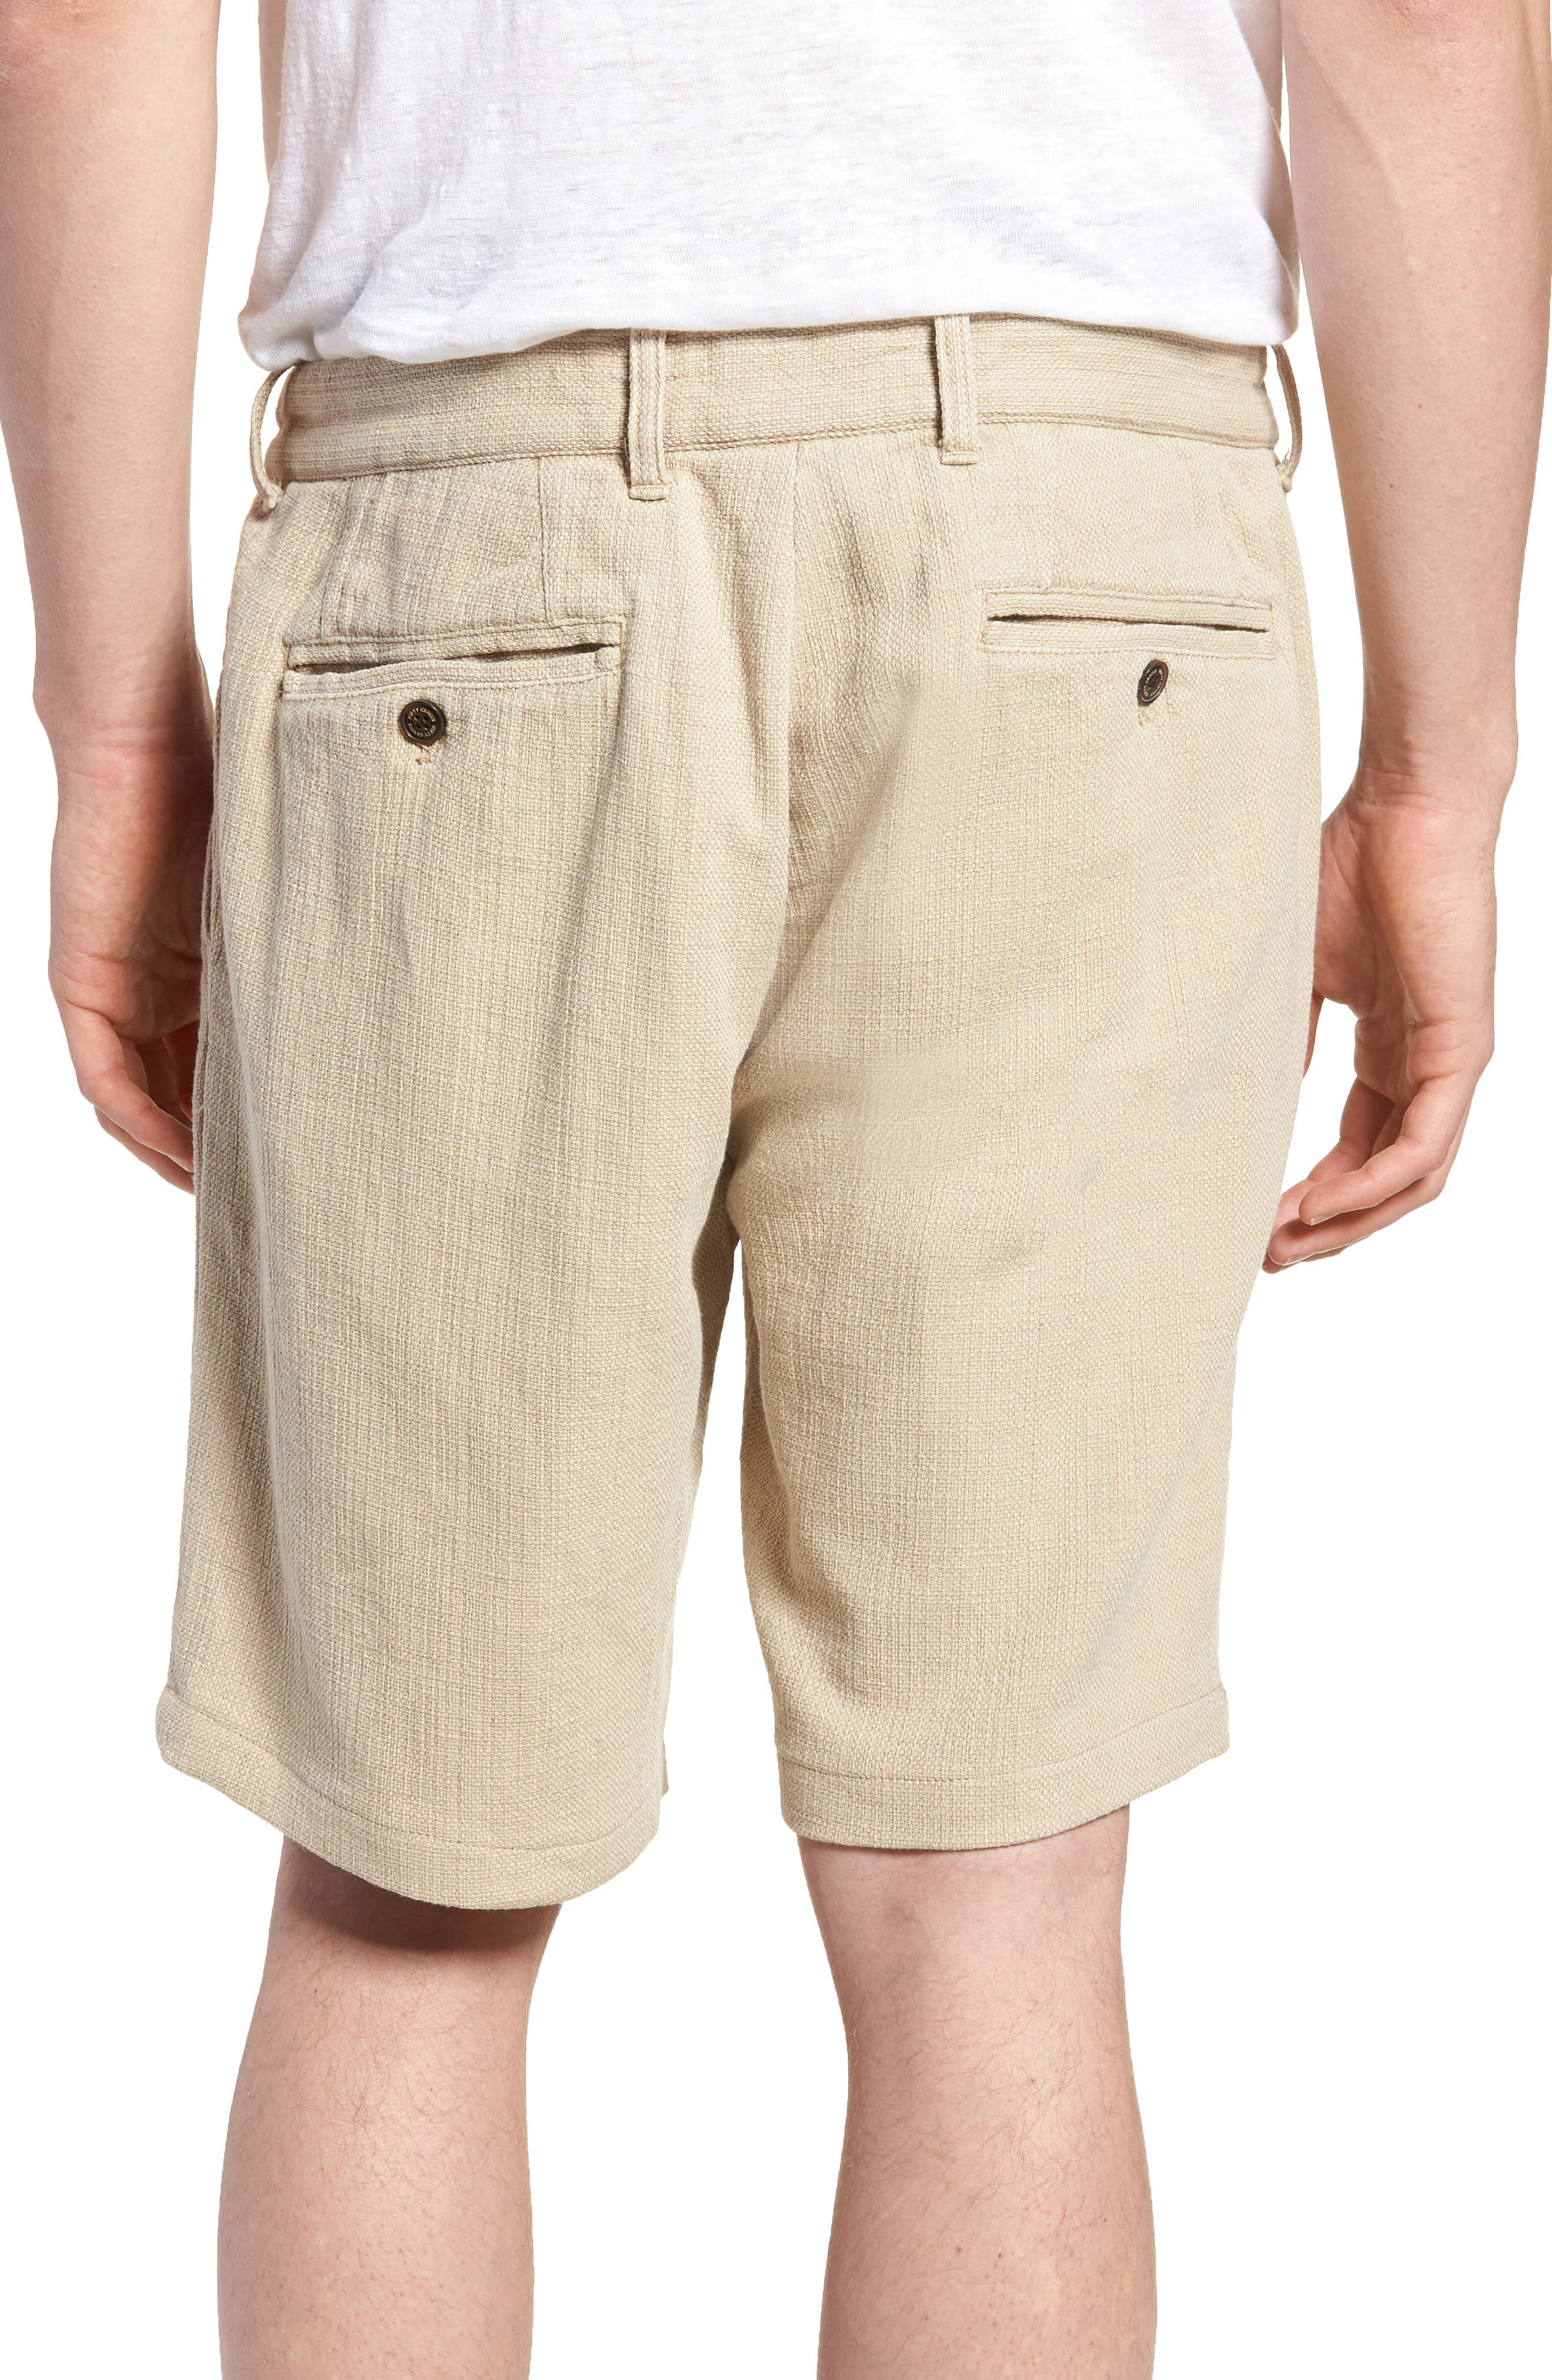 Thomas Regular Fit Pleated Shorts,                             Alternate thumbnail 2, color,                             250